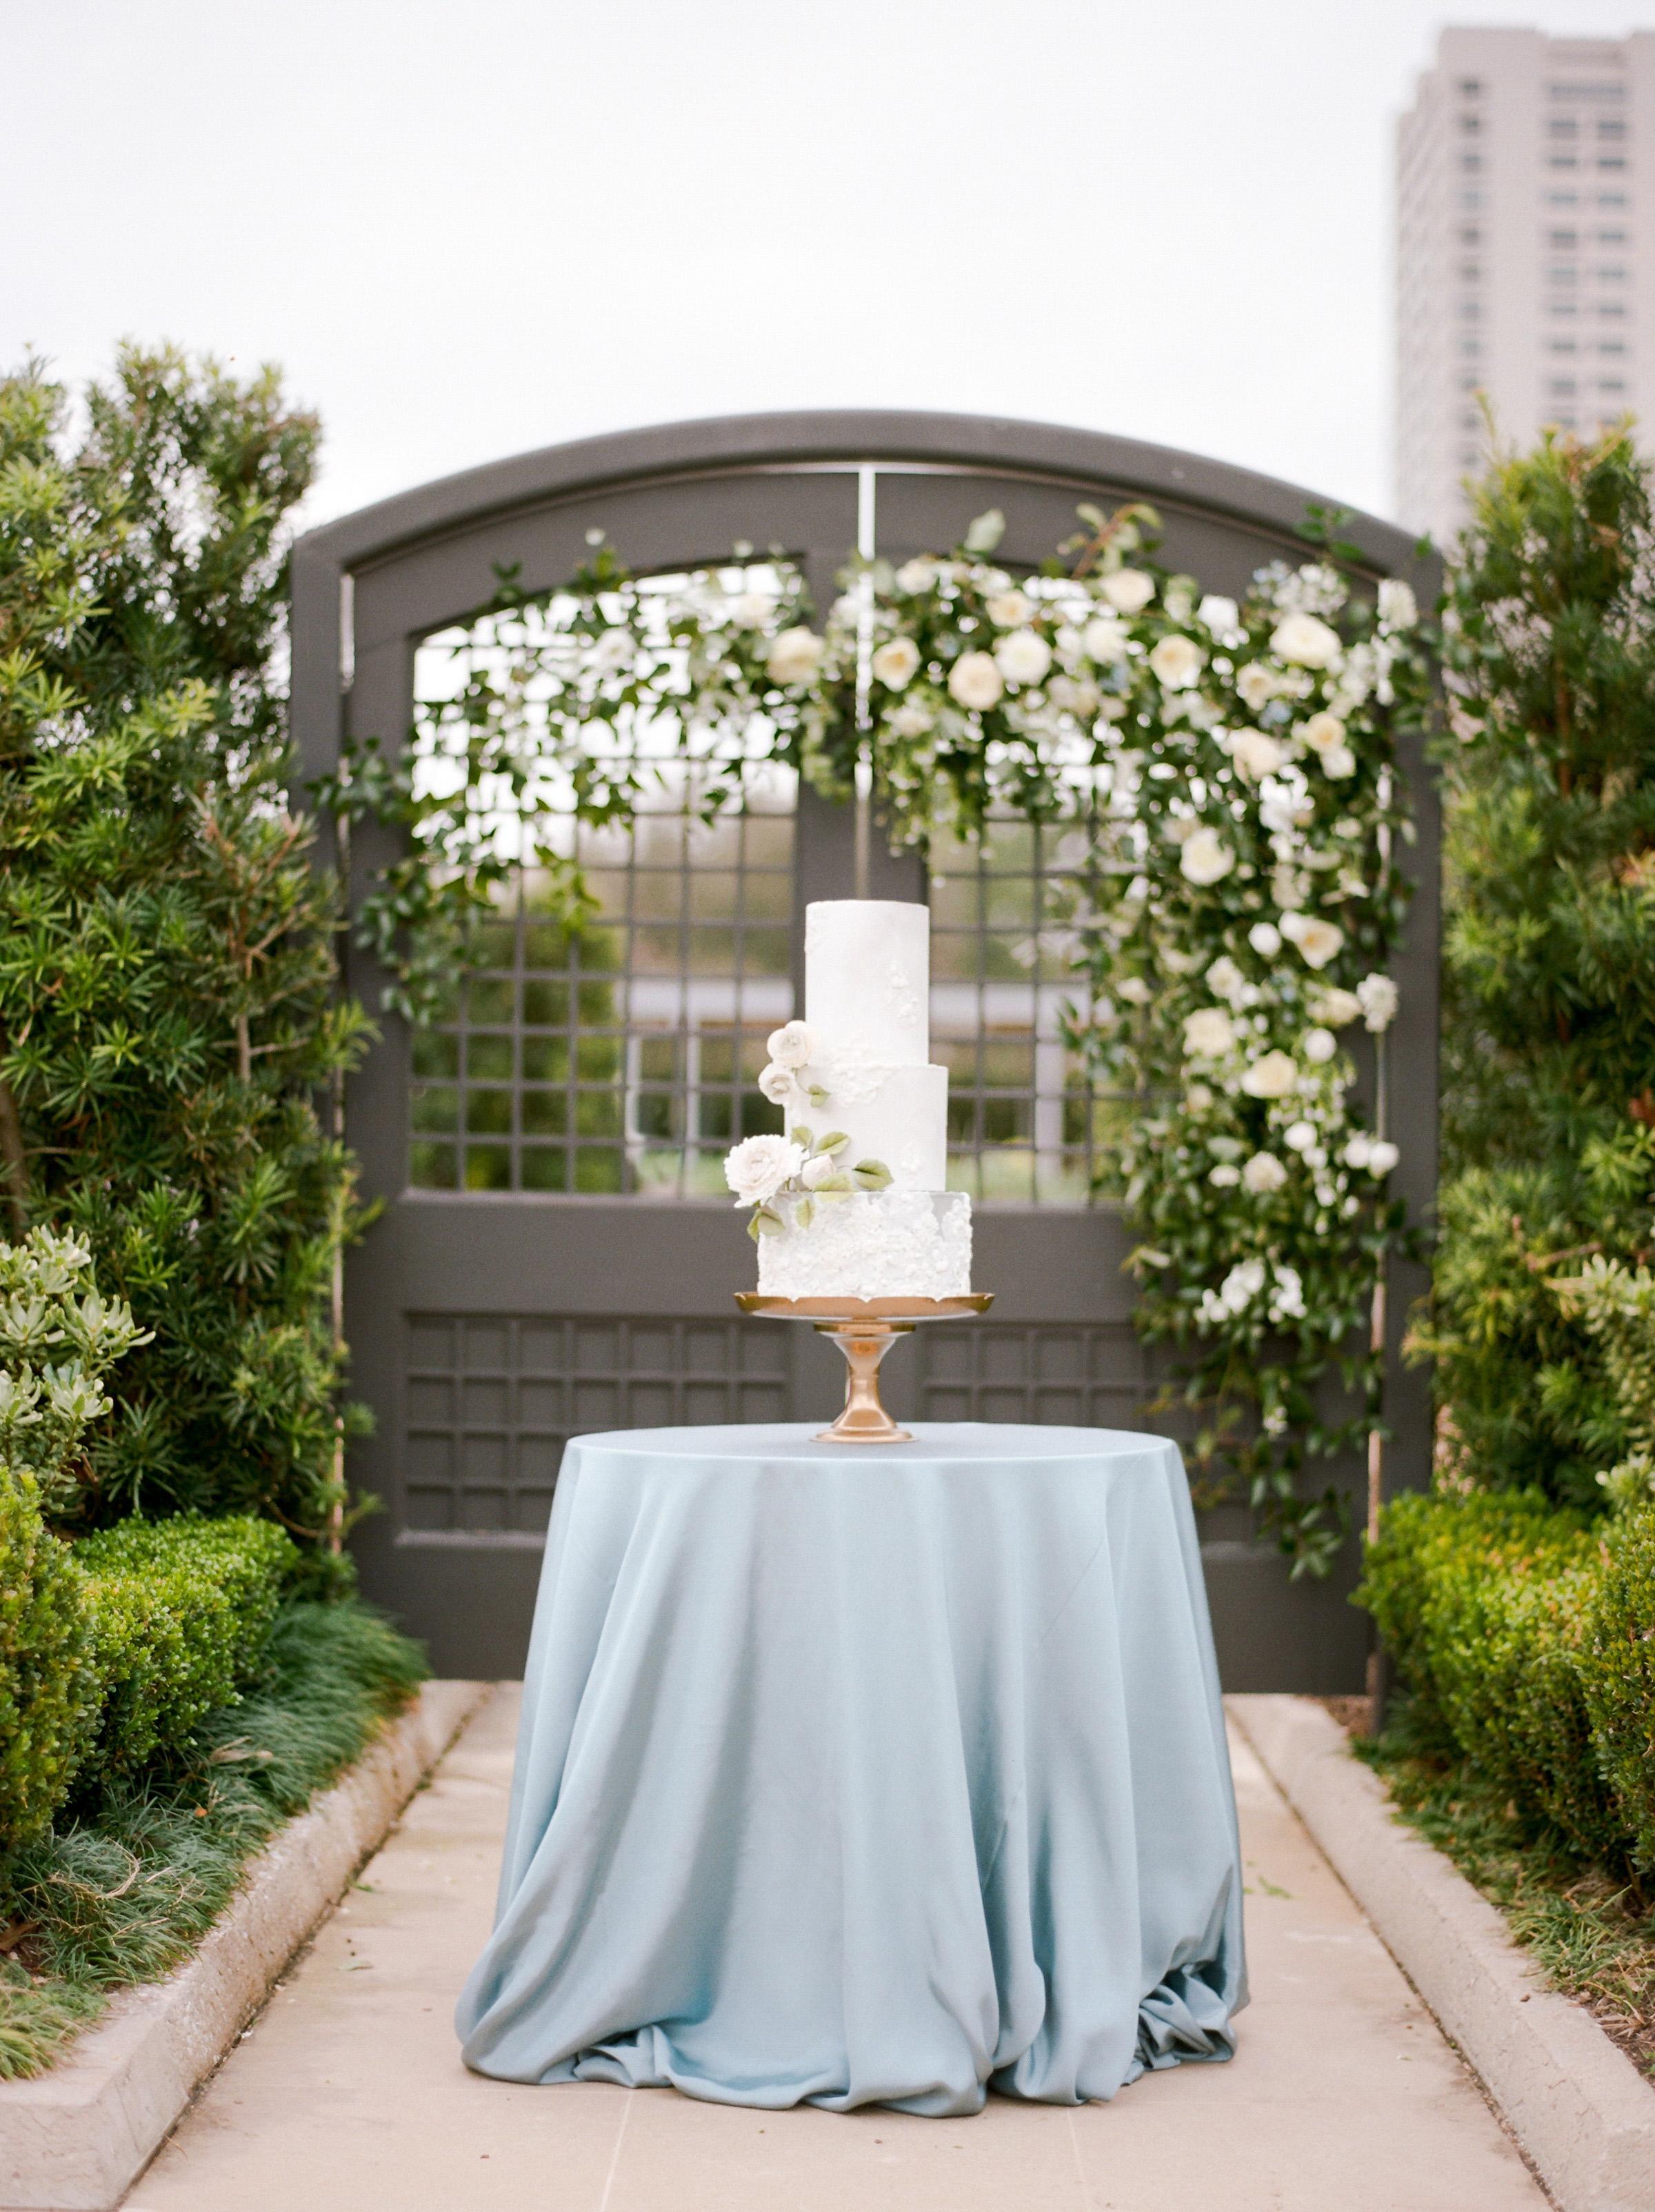 McGovern-Centennial-Gardens-Houston-Texas-Wedding-Venue-Josh-Dana-Fernandez-Photography-Film-Destination-Fine-Art-Luxury-Top-Best-Austin-Dallas-Magnolia-Rouge-Jennifer-Laura-Design-212.jpg